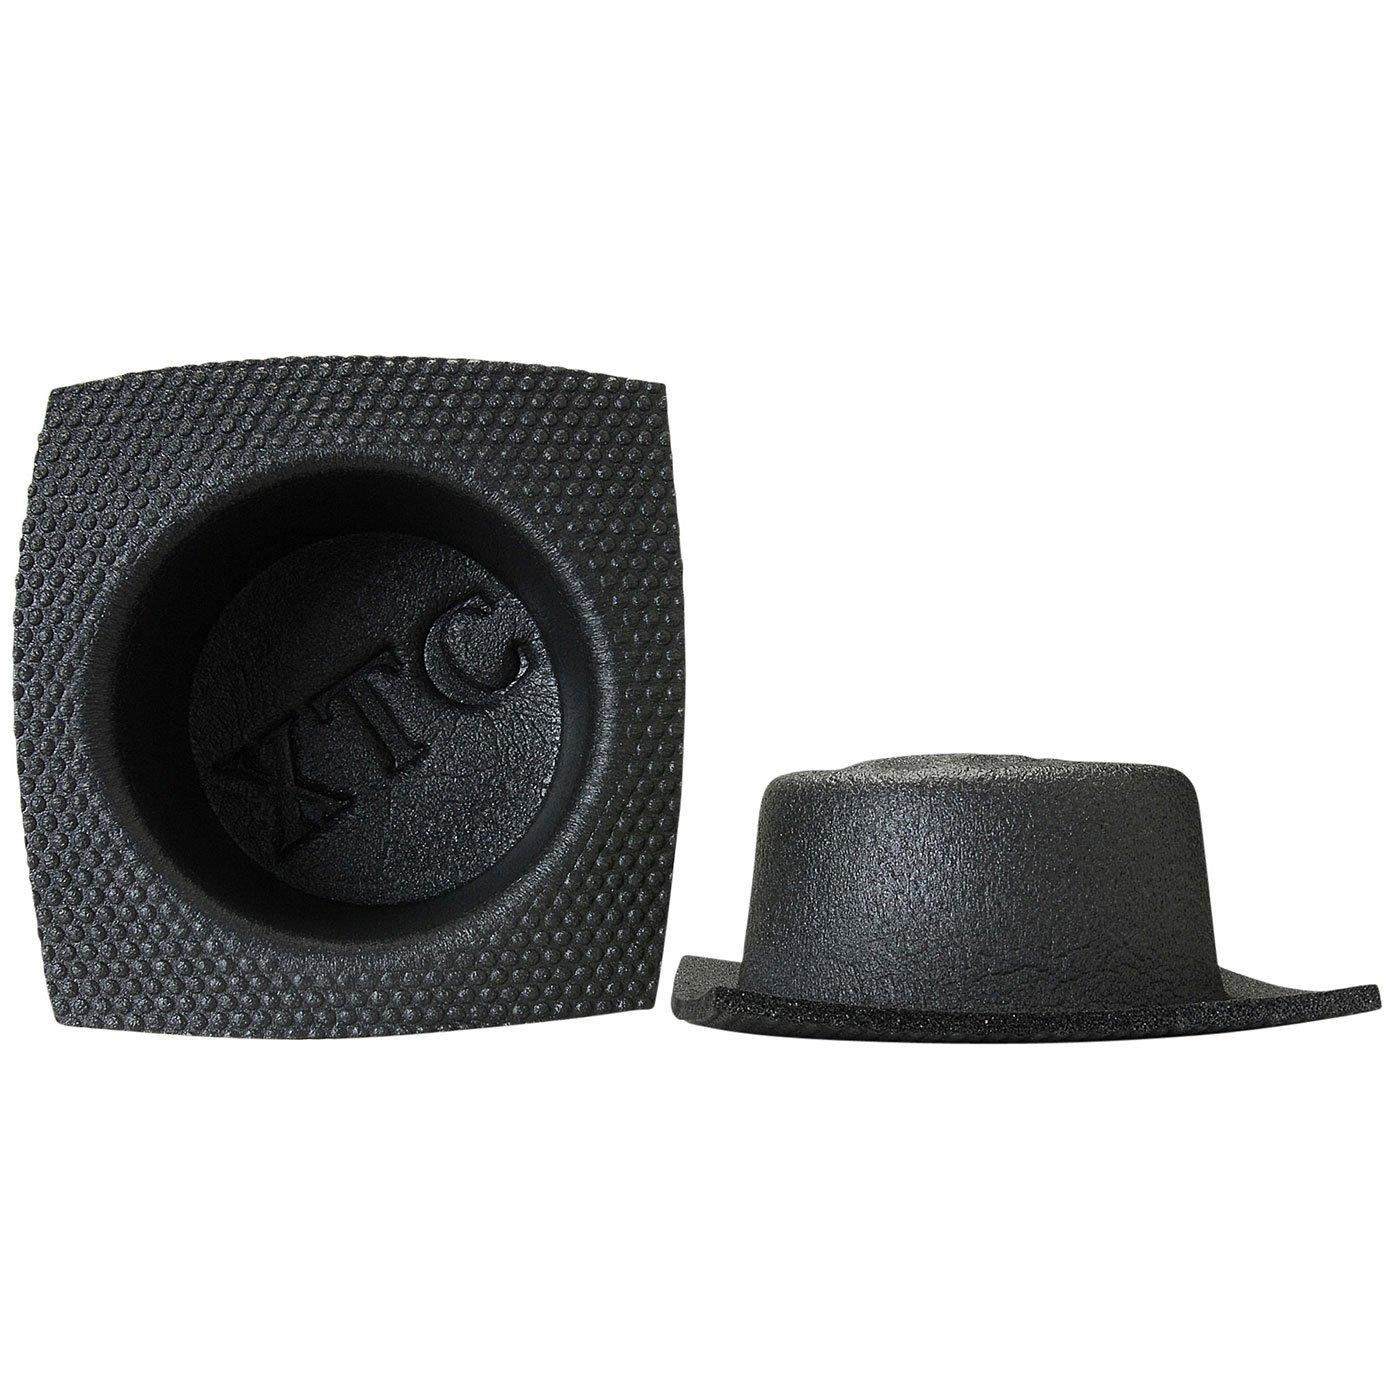 Vertek//XTC XTC 6-3//4 Round Large Frame Shallow Foam Baffle Pair 4350459415